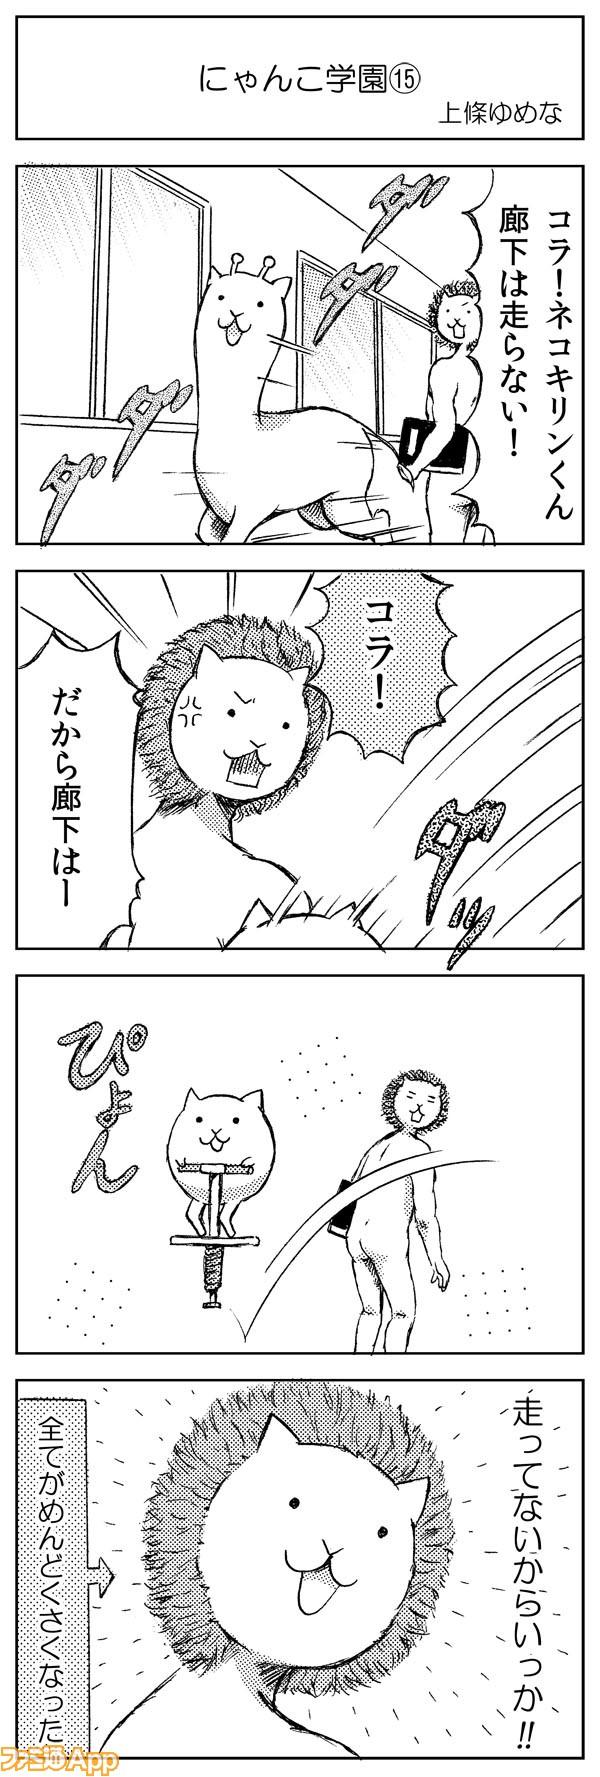 03kami_075